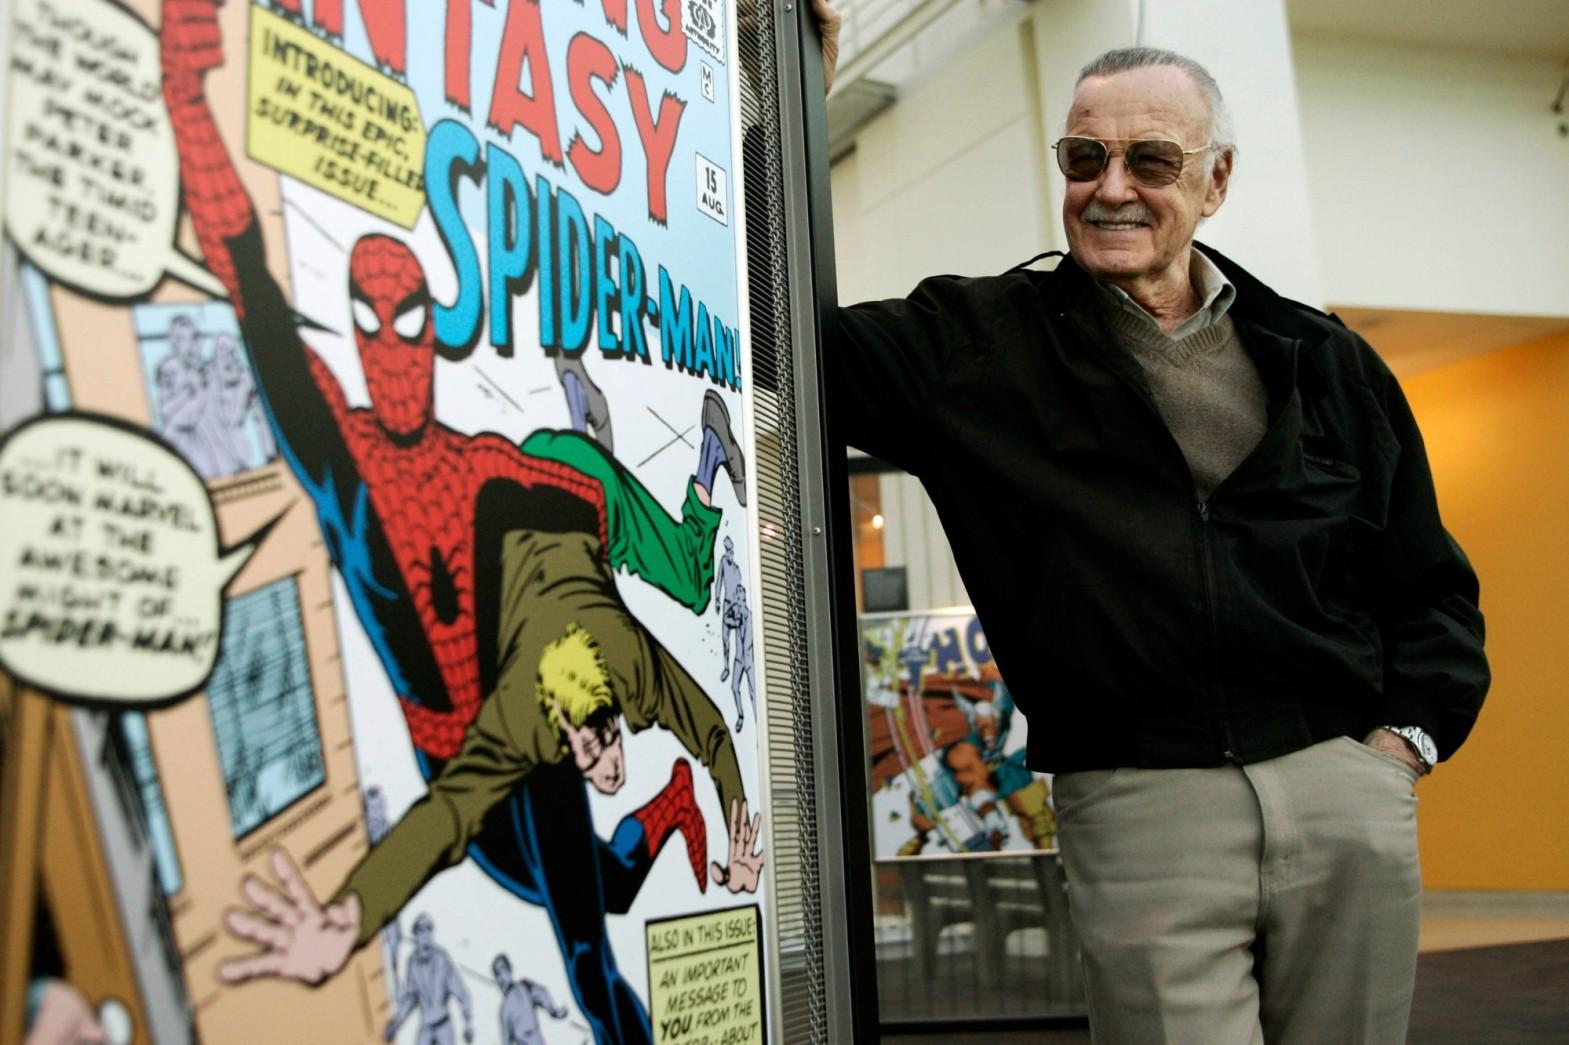 Disney sues comic book artists, brother of Stan Lee, over Marvel superheroes